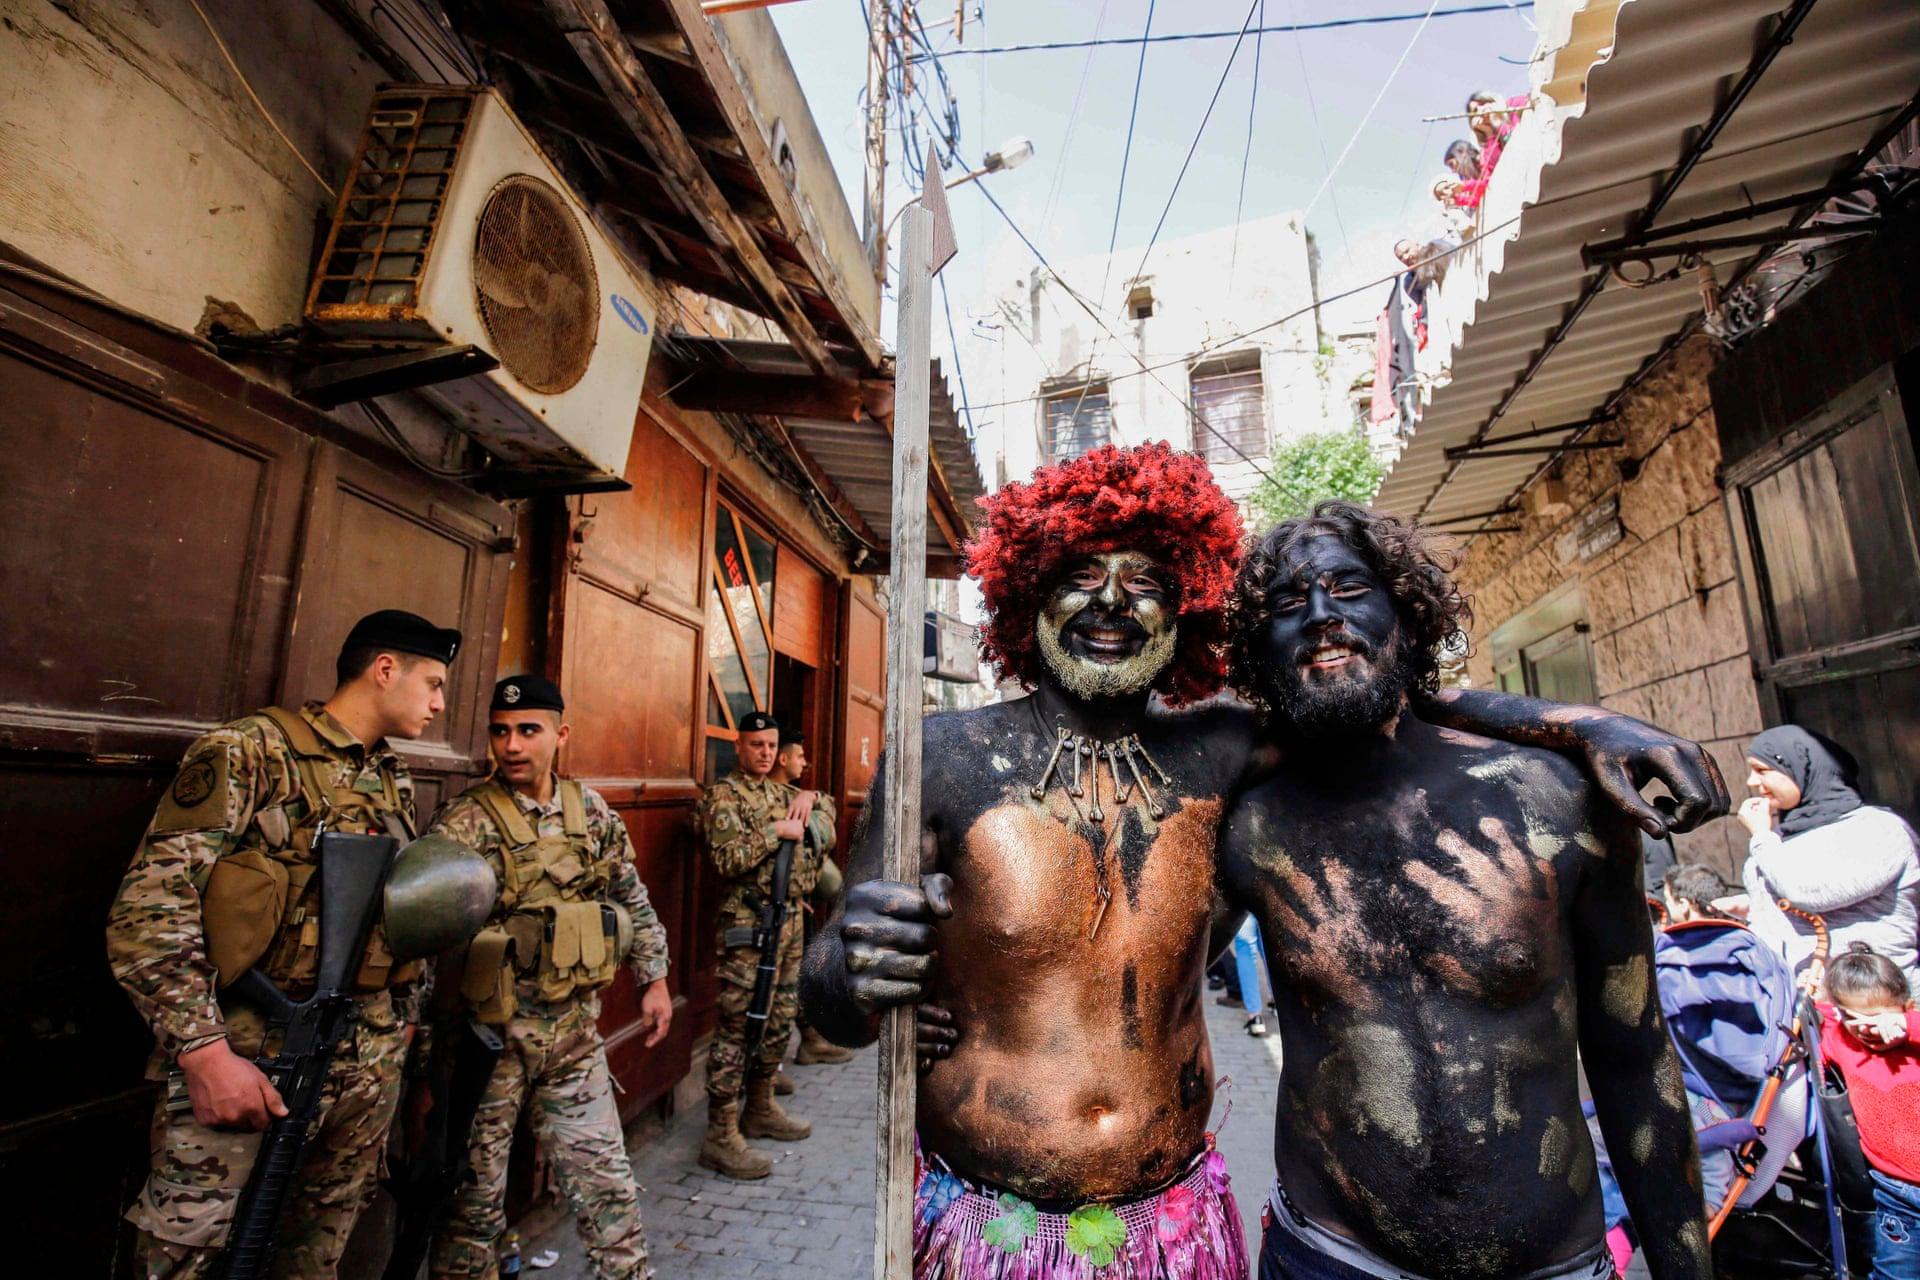 Ibrahim Chalhoub/Getty Images/Scanpix